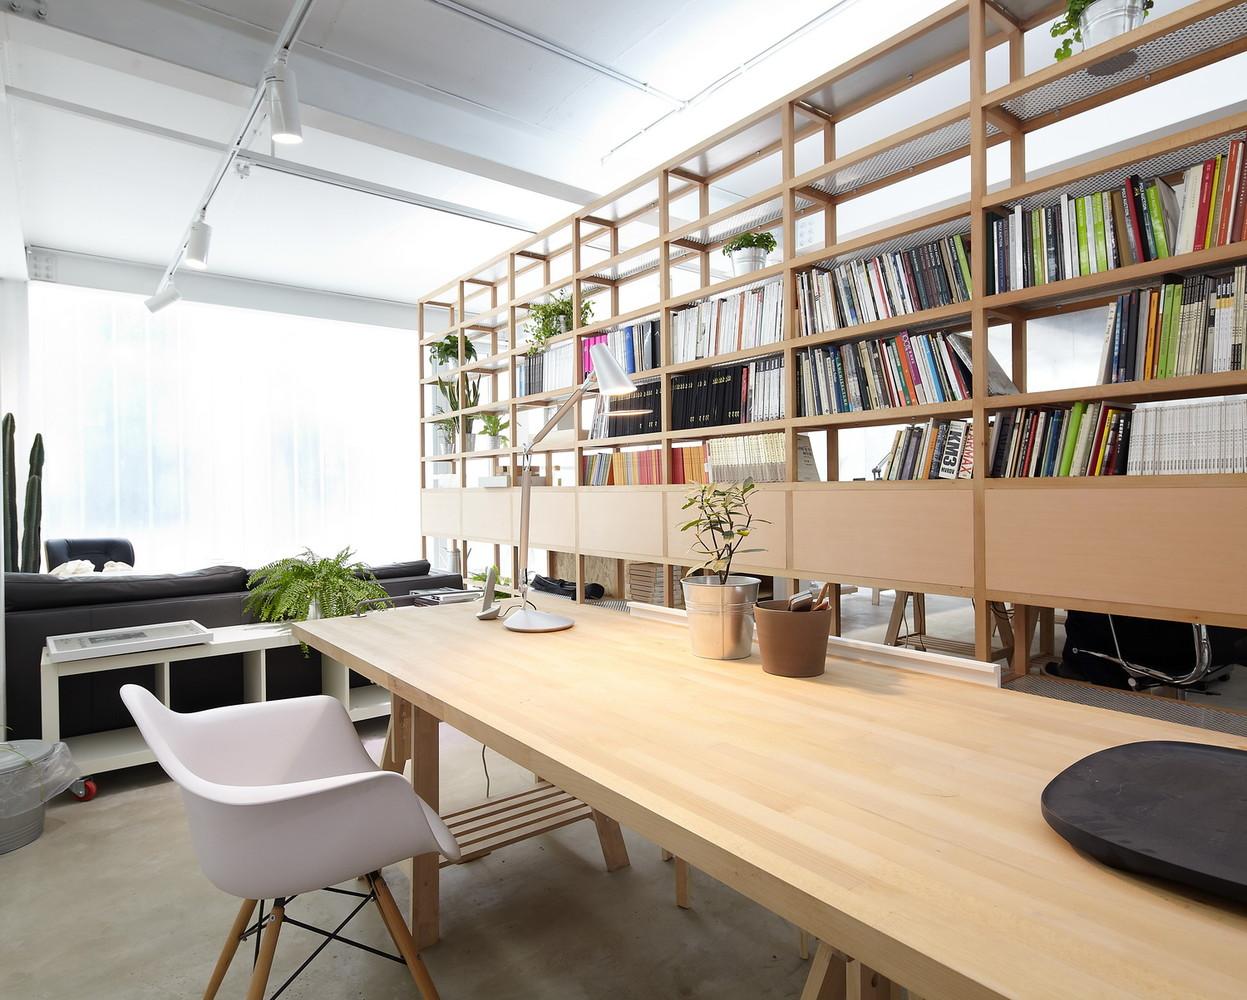 TAOA Studio,Courtesy Of Tao Lei Architecture Studio